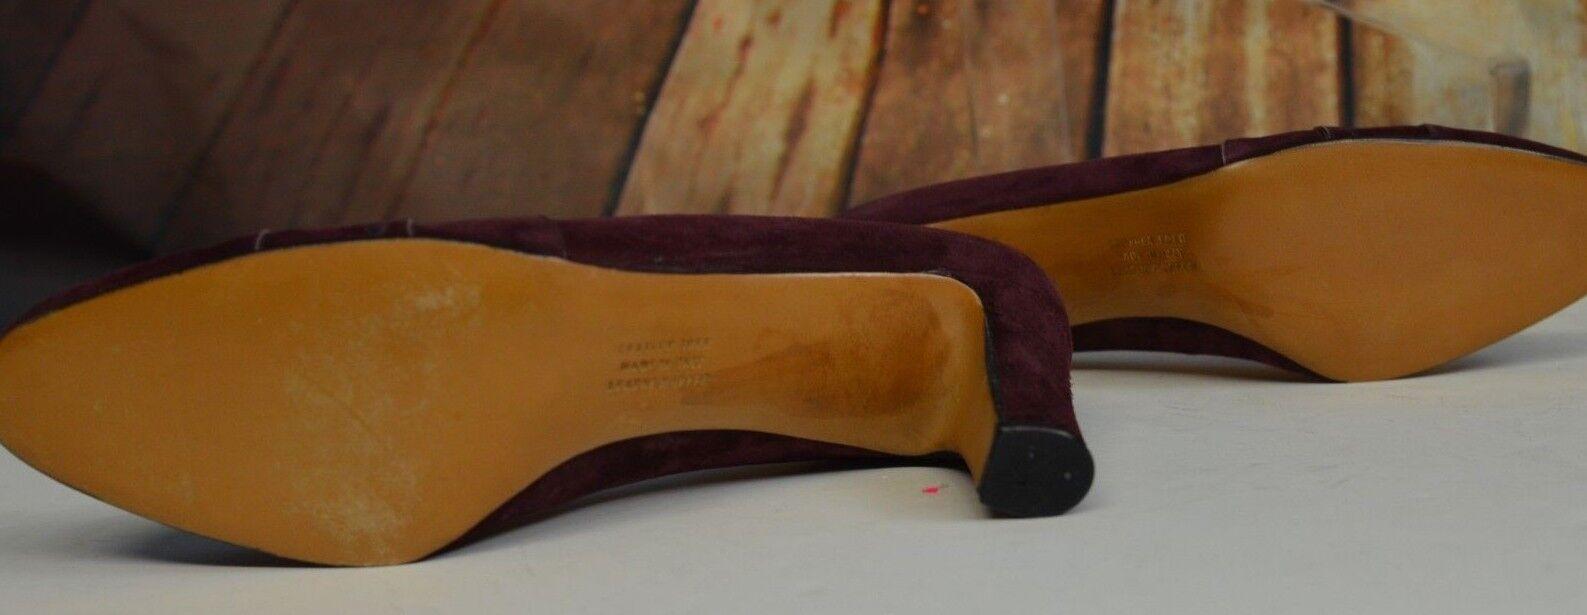 Salvatore Ferragamo Suede Größe 9 AA Leder Suede Ferragamo Burgundy Wine 2.5